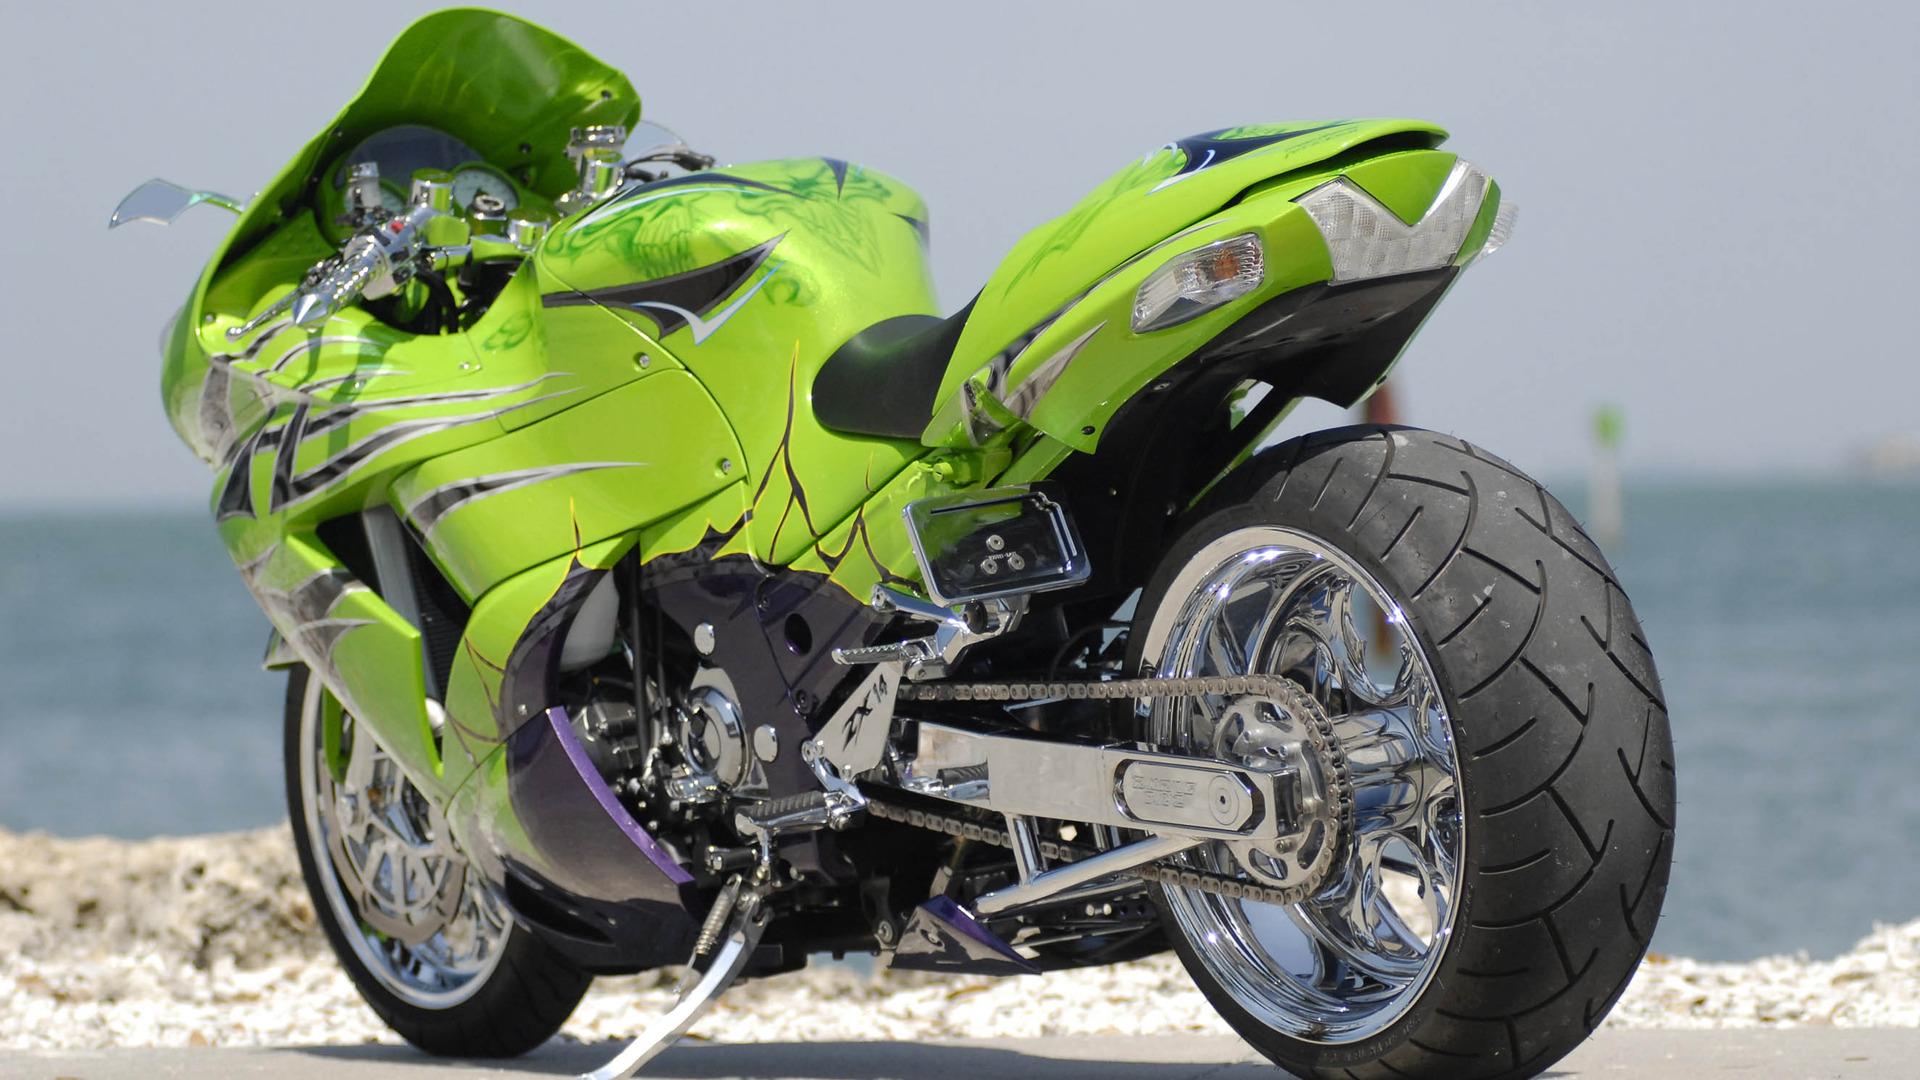 35 HD Bike Wallpapers for Desktop Download 1920x1080